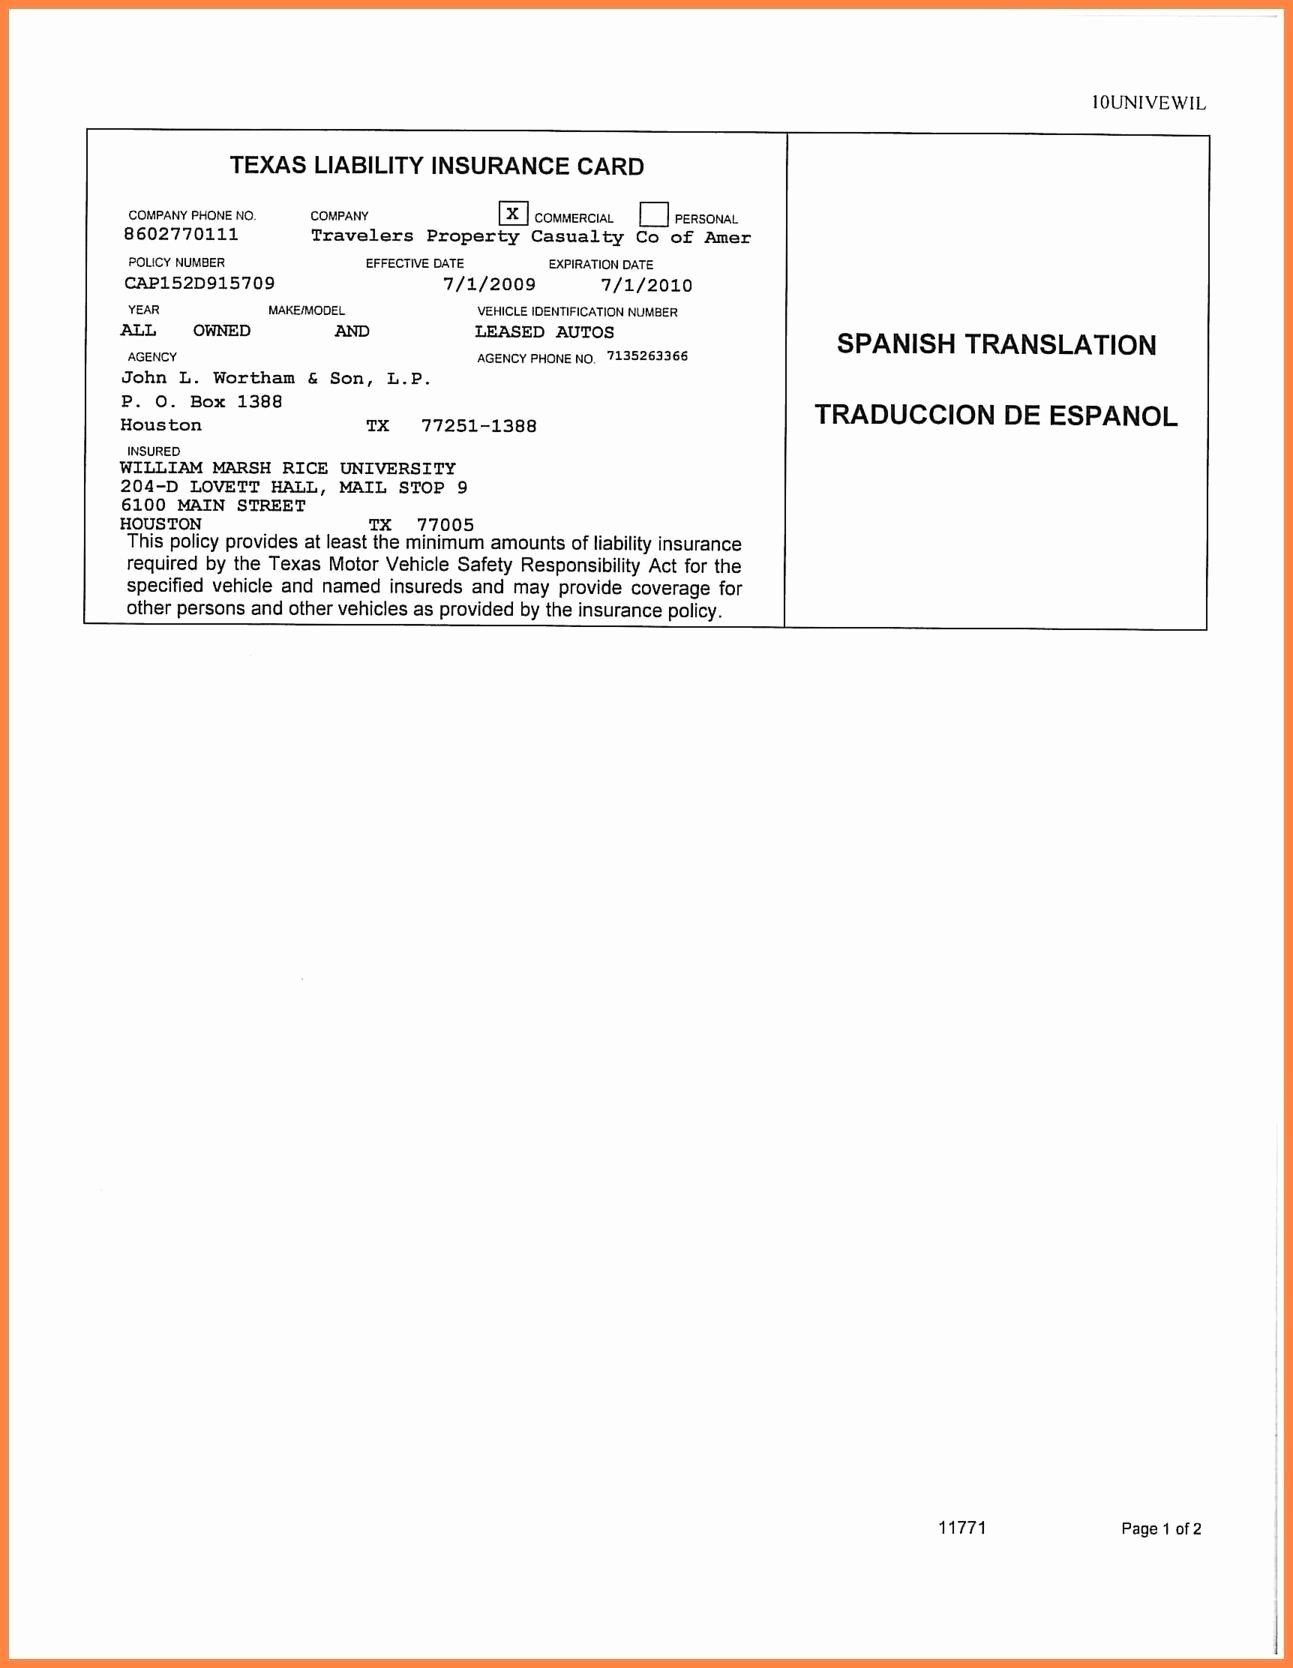 Fake Car Insurance Card Luxury Car Insurance Card Template Free Auto Insurance Card